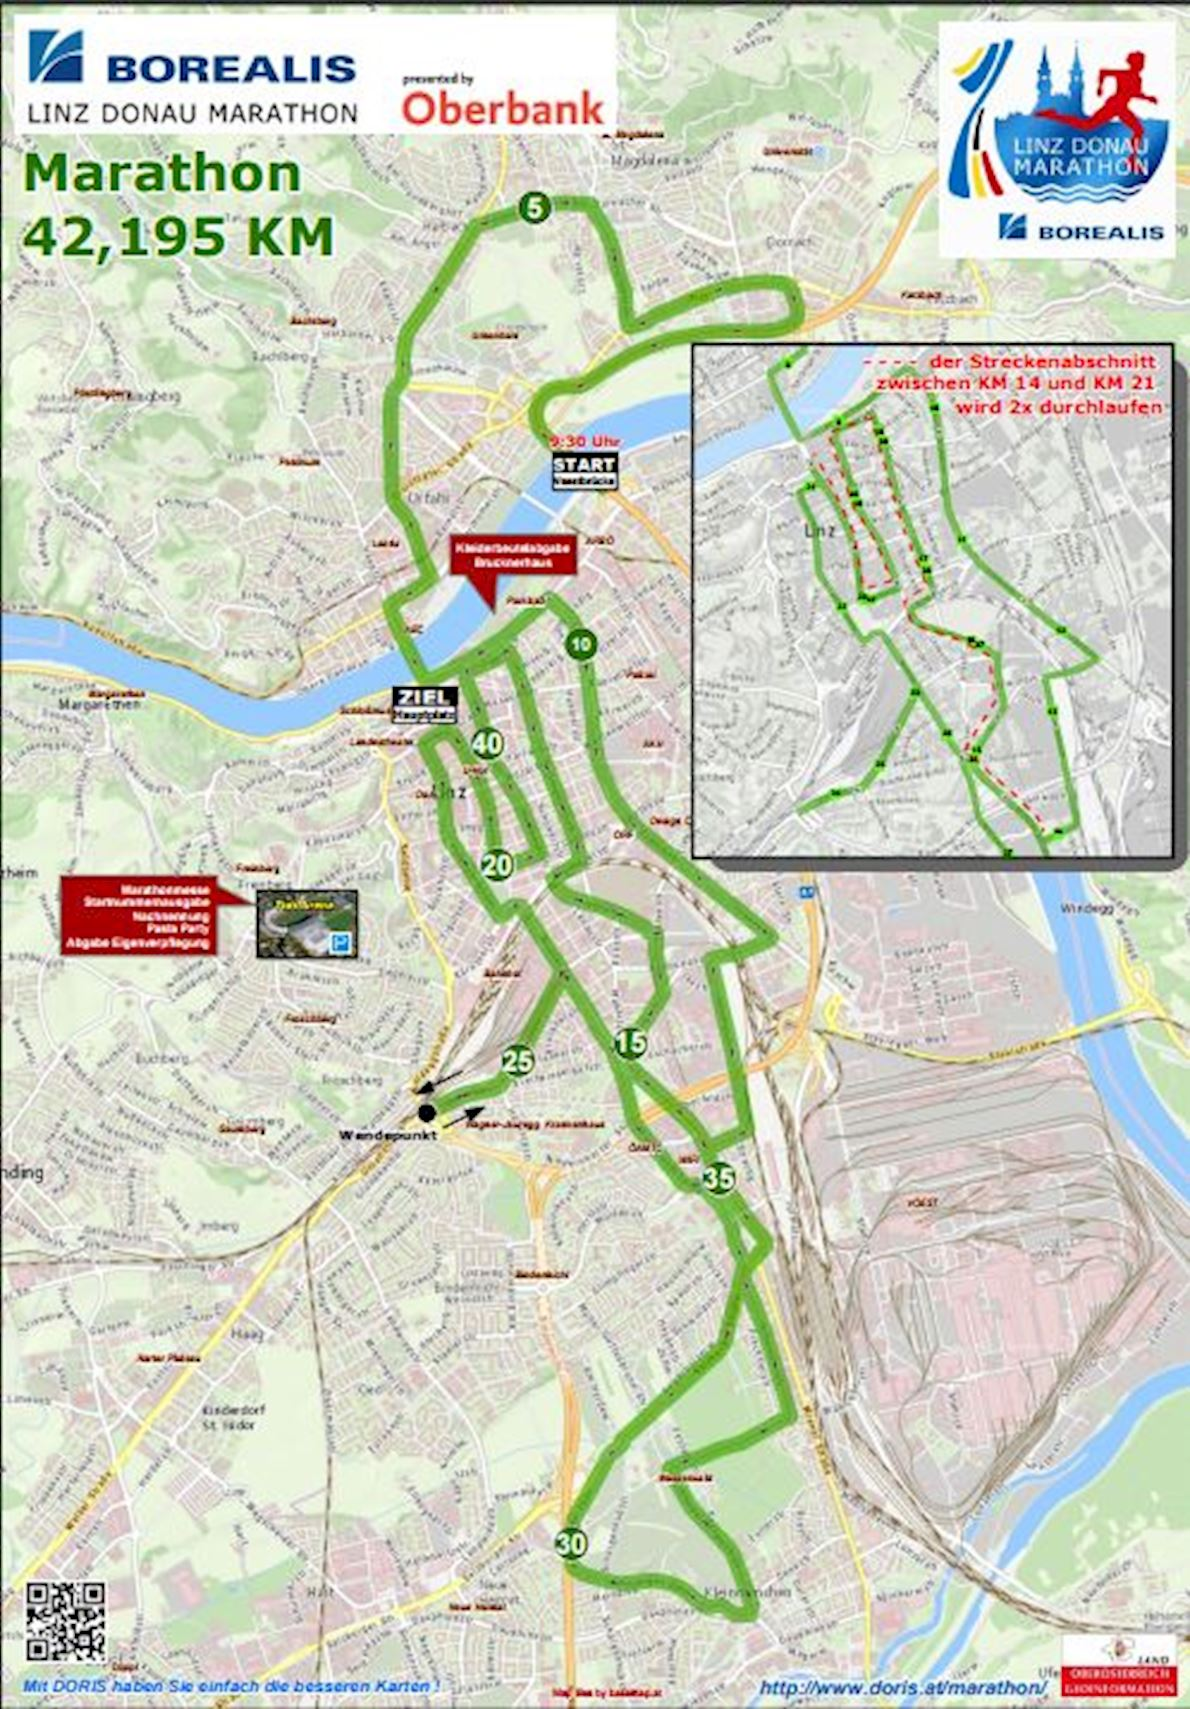 Oberbank Linz Donau Marathon Mappa del percorso